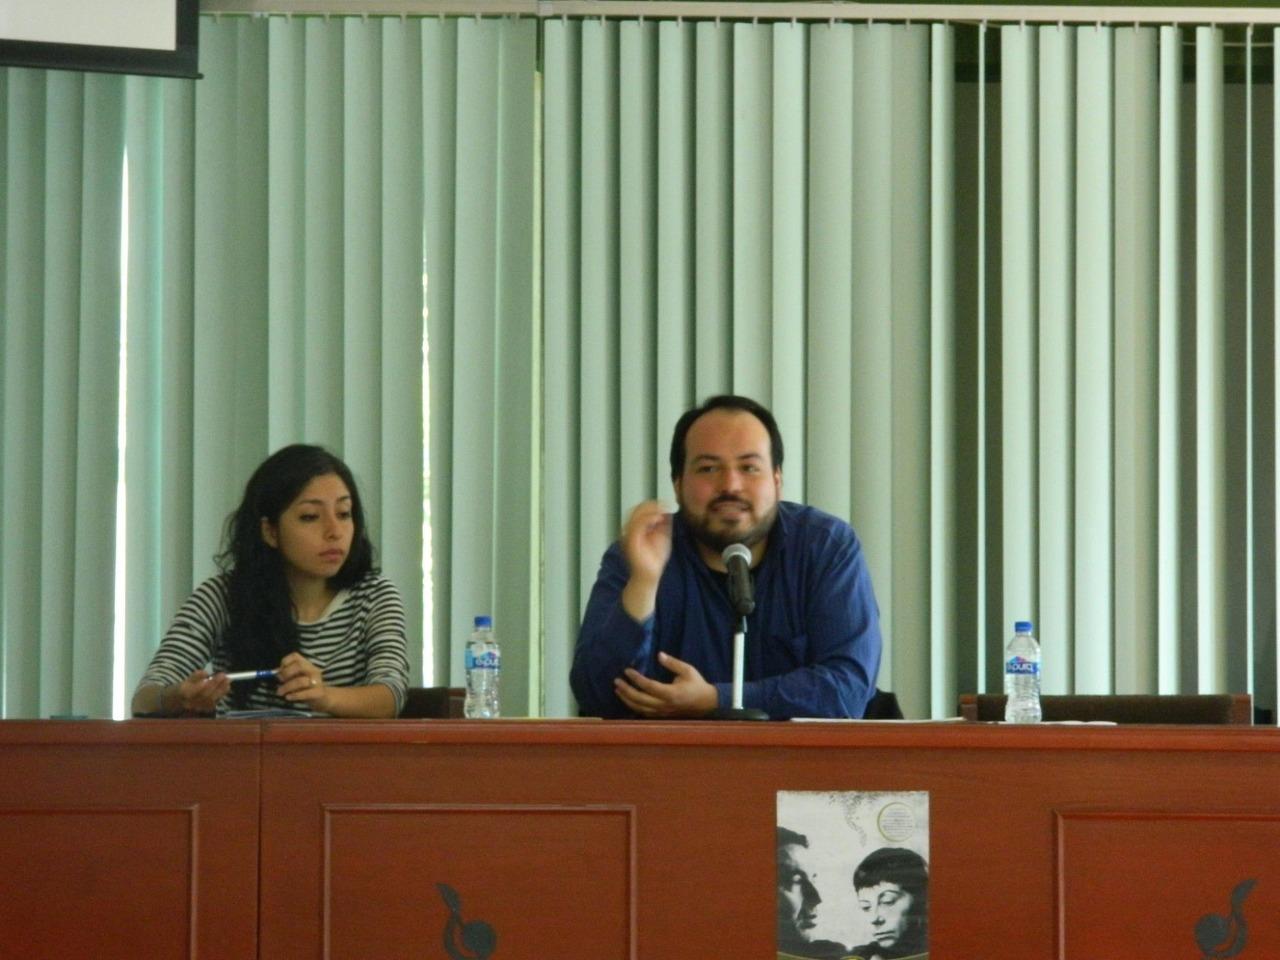 OFRECEN SEMINARIO EN LÍNEA SOBRE LITERATURA MEXICANA CONTEMPORÁNEA